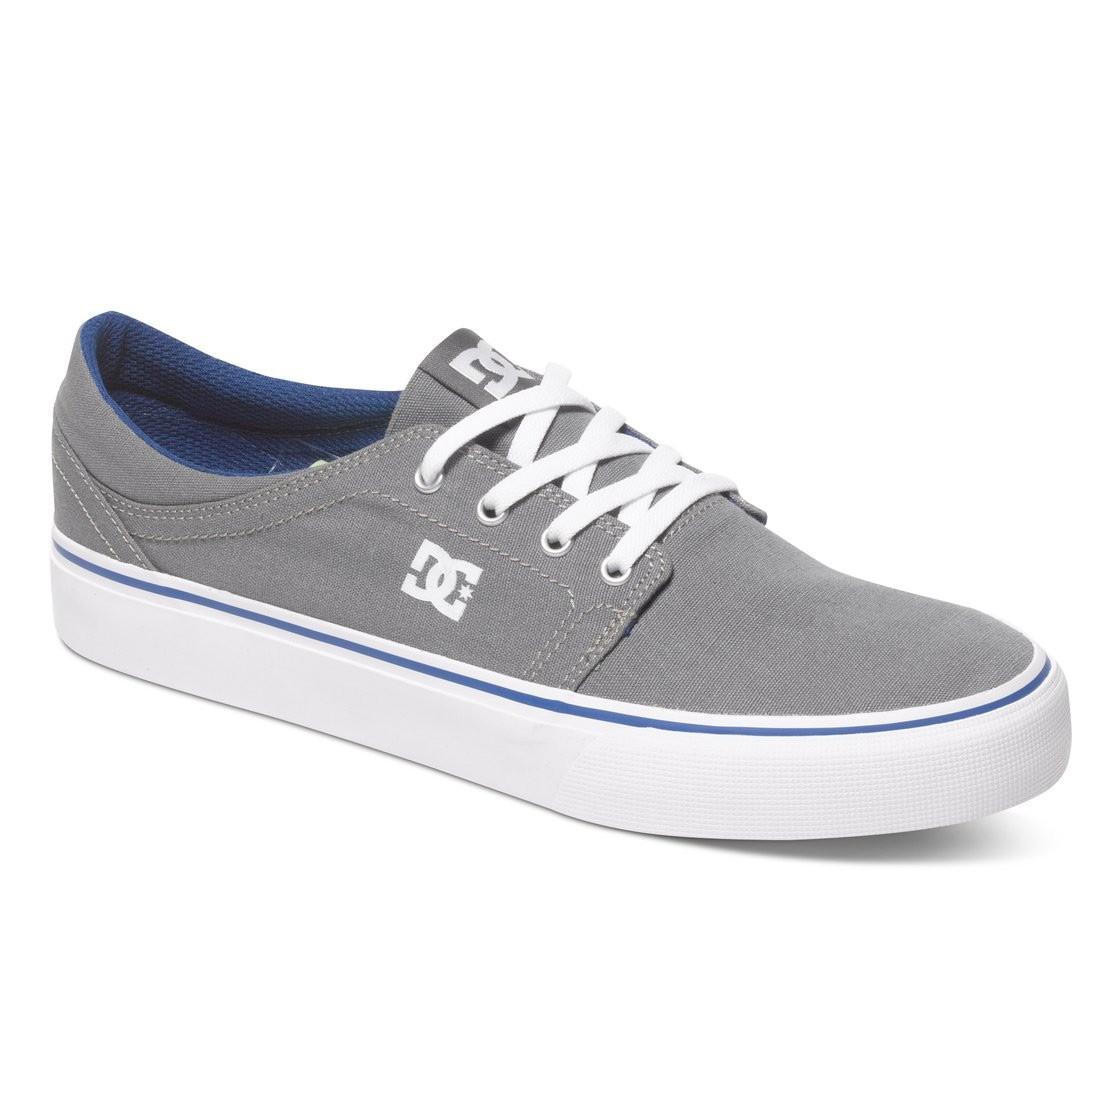 Tenisky DC Trase Tx grey/blue